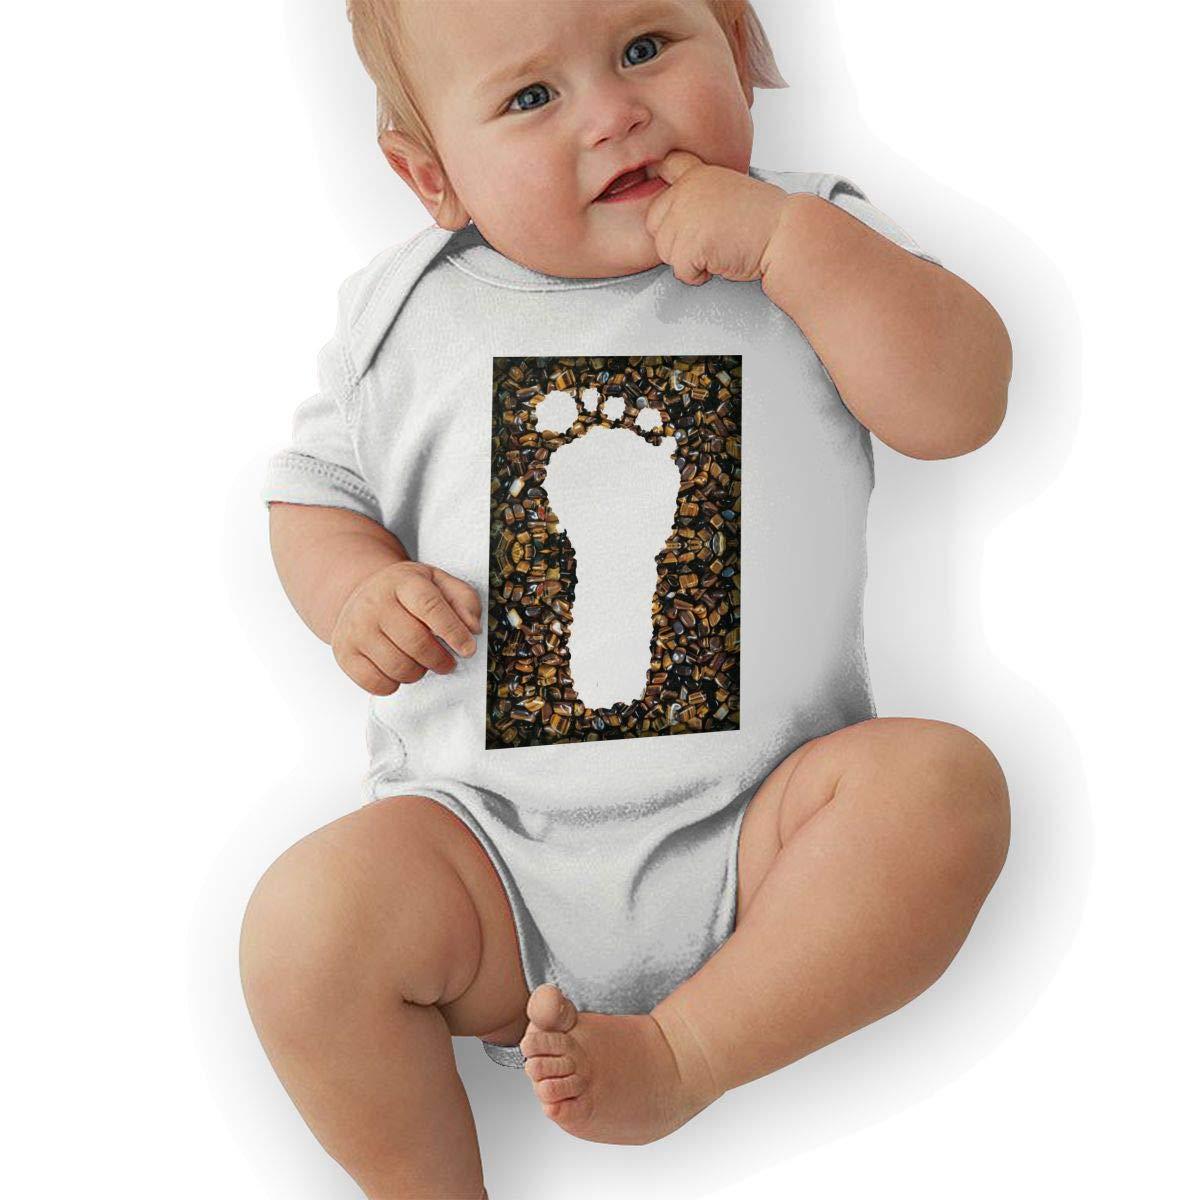 Newborn Baby Boys Bodysuit Short-Sleeve Onesie Creative Footprints Print Outfit Summer Pajamas